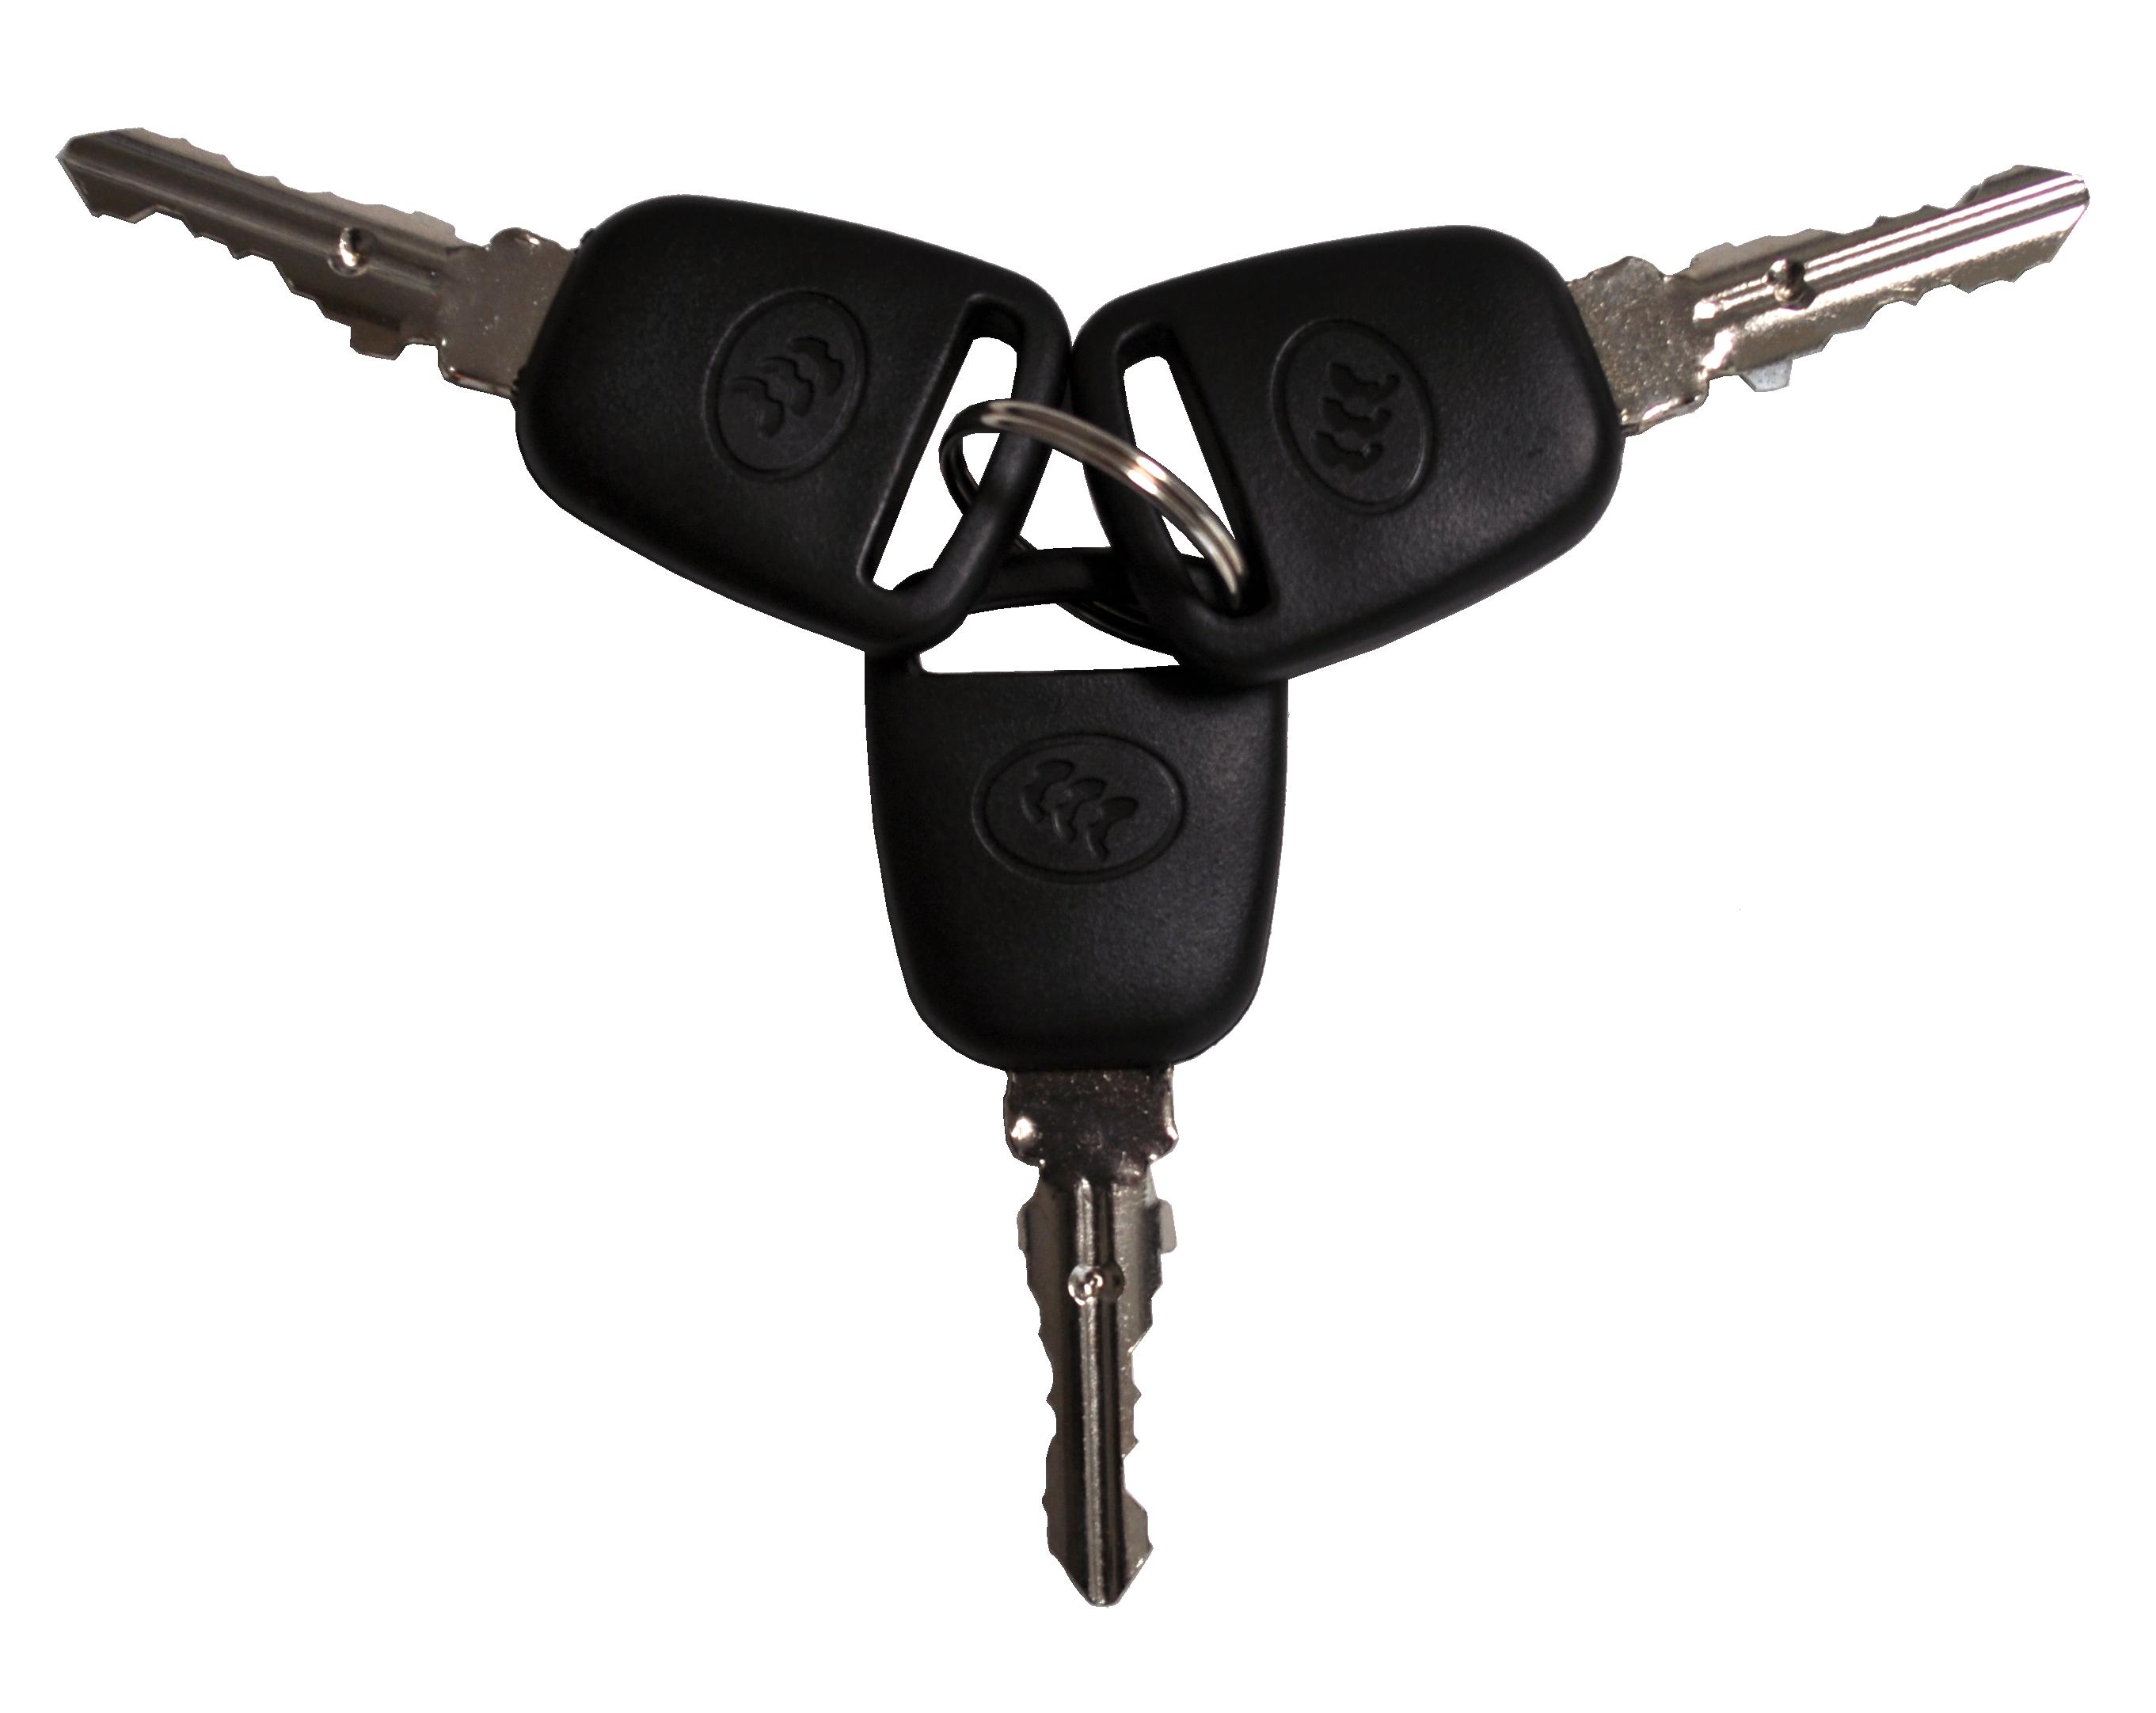 KFZ Autoalarm  1 Fernbedienung SWAT  Lenkradkralle mit Alarm Lenkradsperre